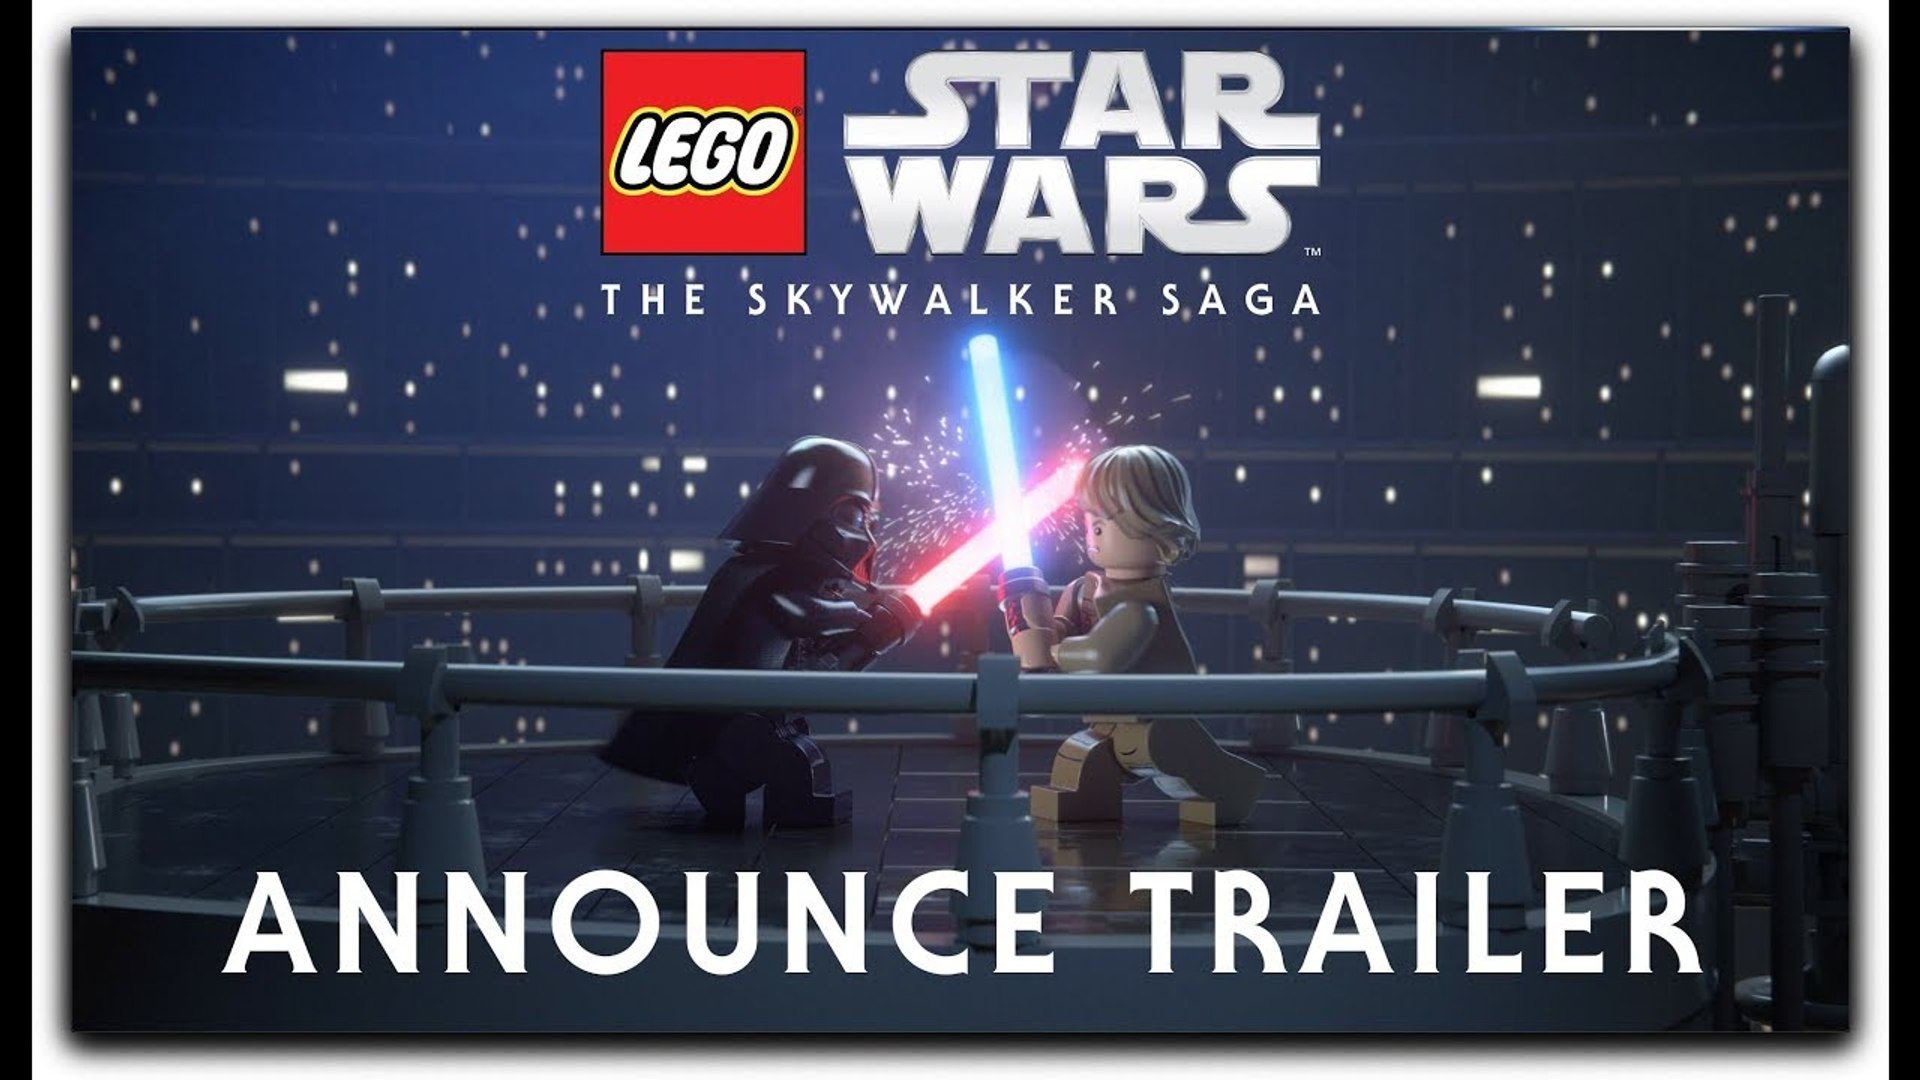 Lego Star Wars The Skywalker Saga Official Reveal Trailer E3 2019 Video Dailymotion